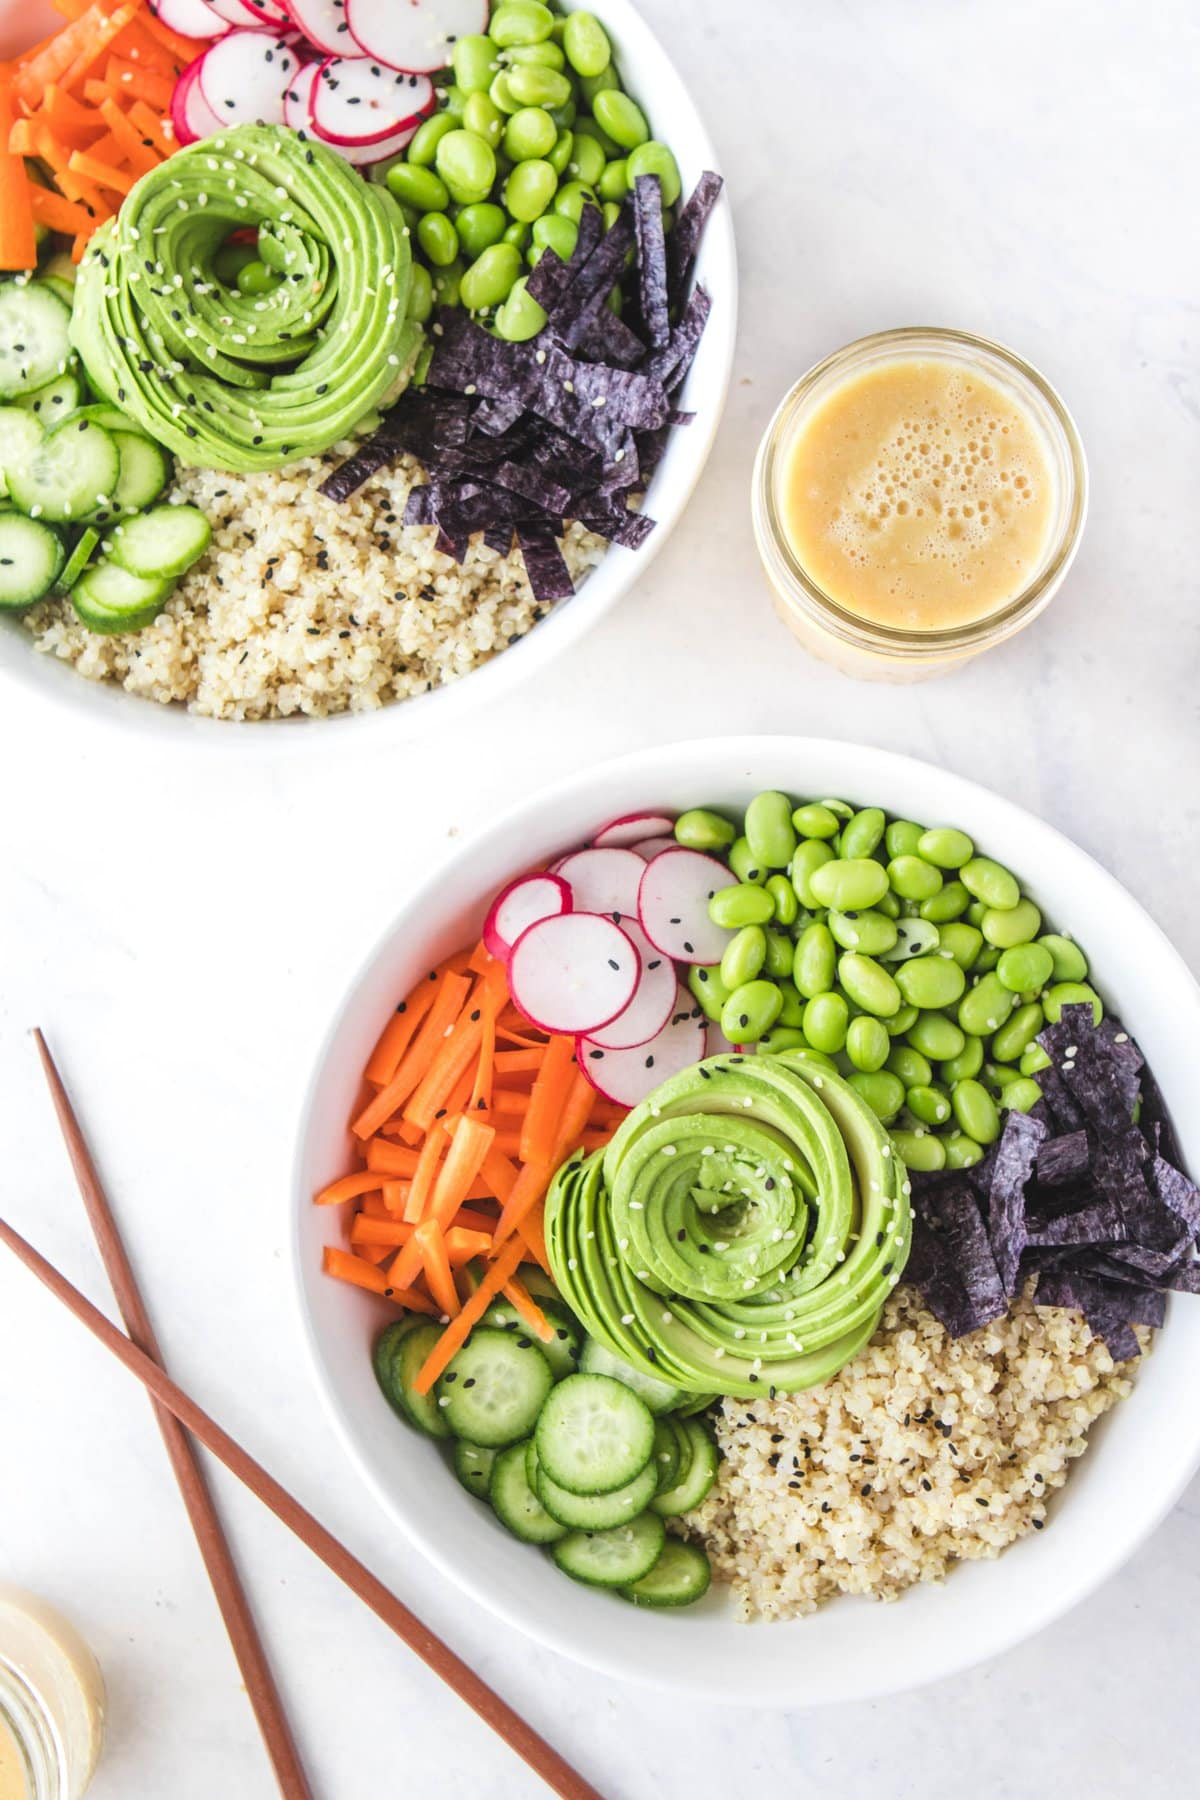 These Quinoa Sushi Bowls with Orange Miso Dressing are gluten free, oil free, and great for vegan meal prep! #sushi #sushibowl #vegansushi #quinoa #plantbased #vegan #buddhabowl #quinoabowl #mealprep via frommybowl.com